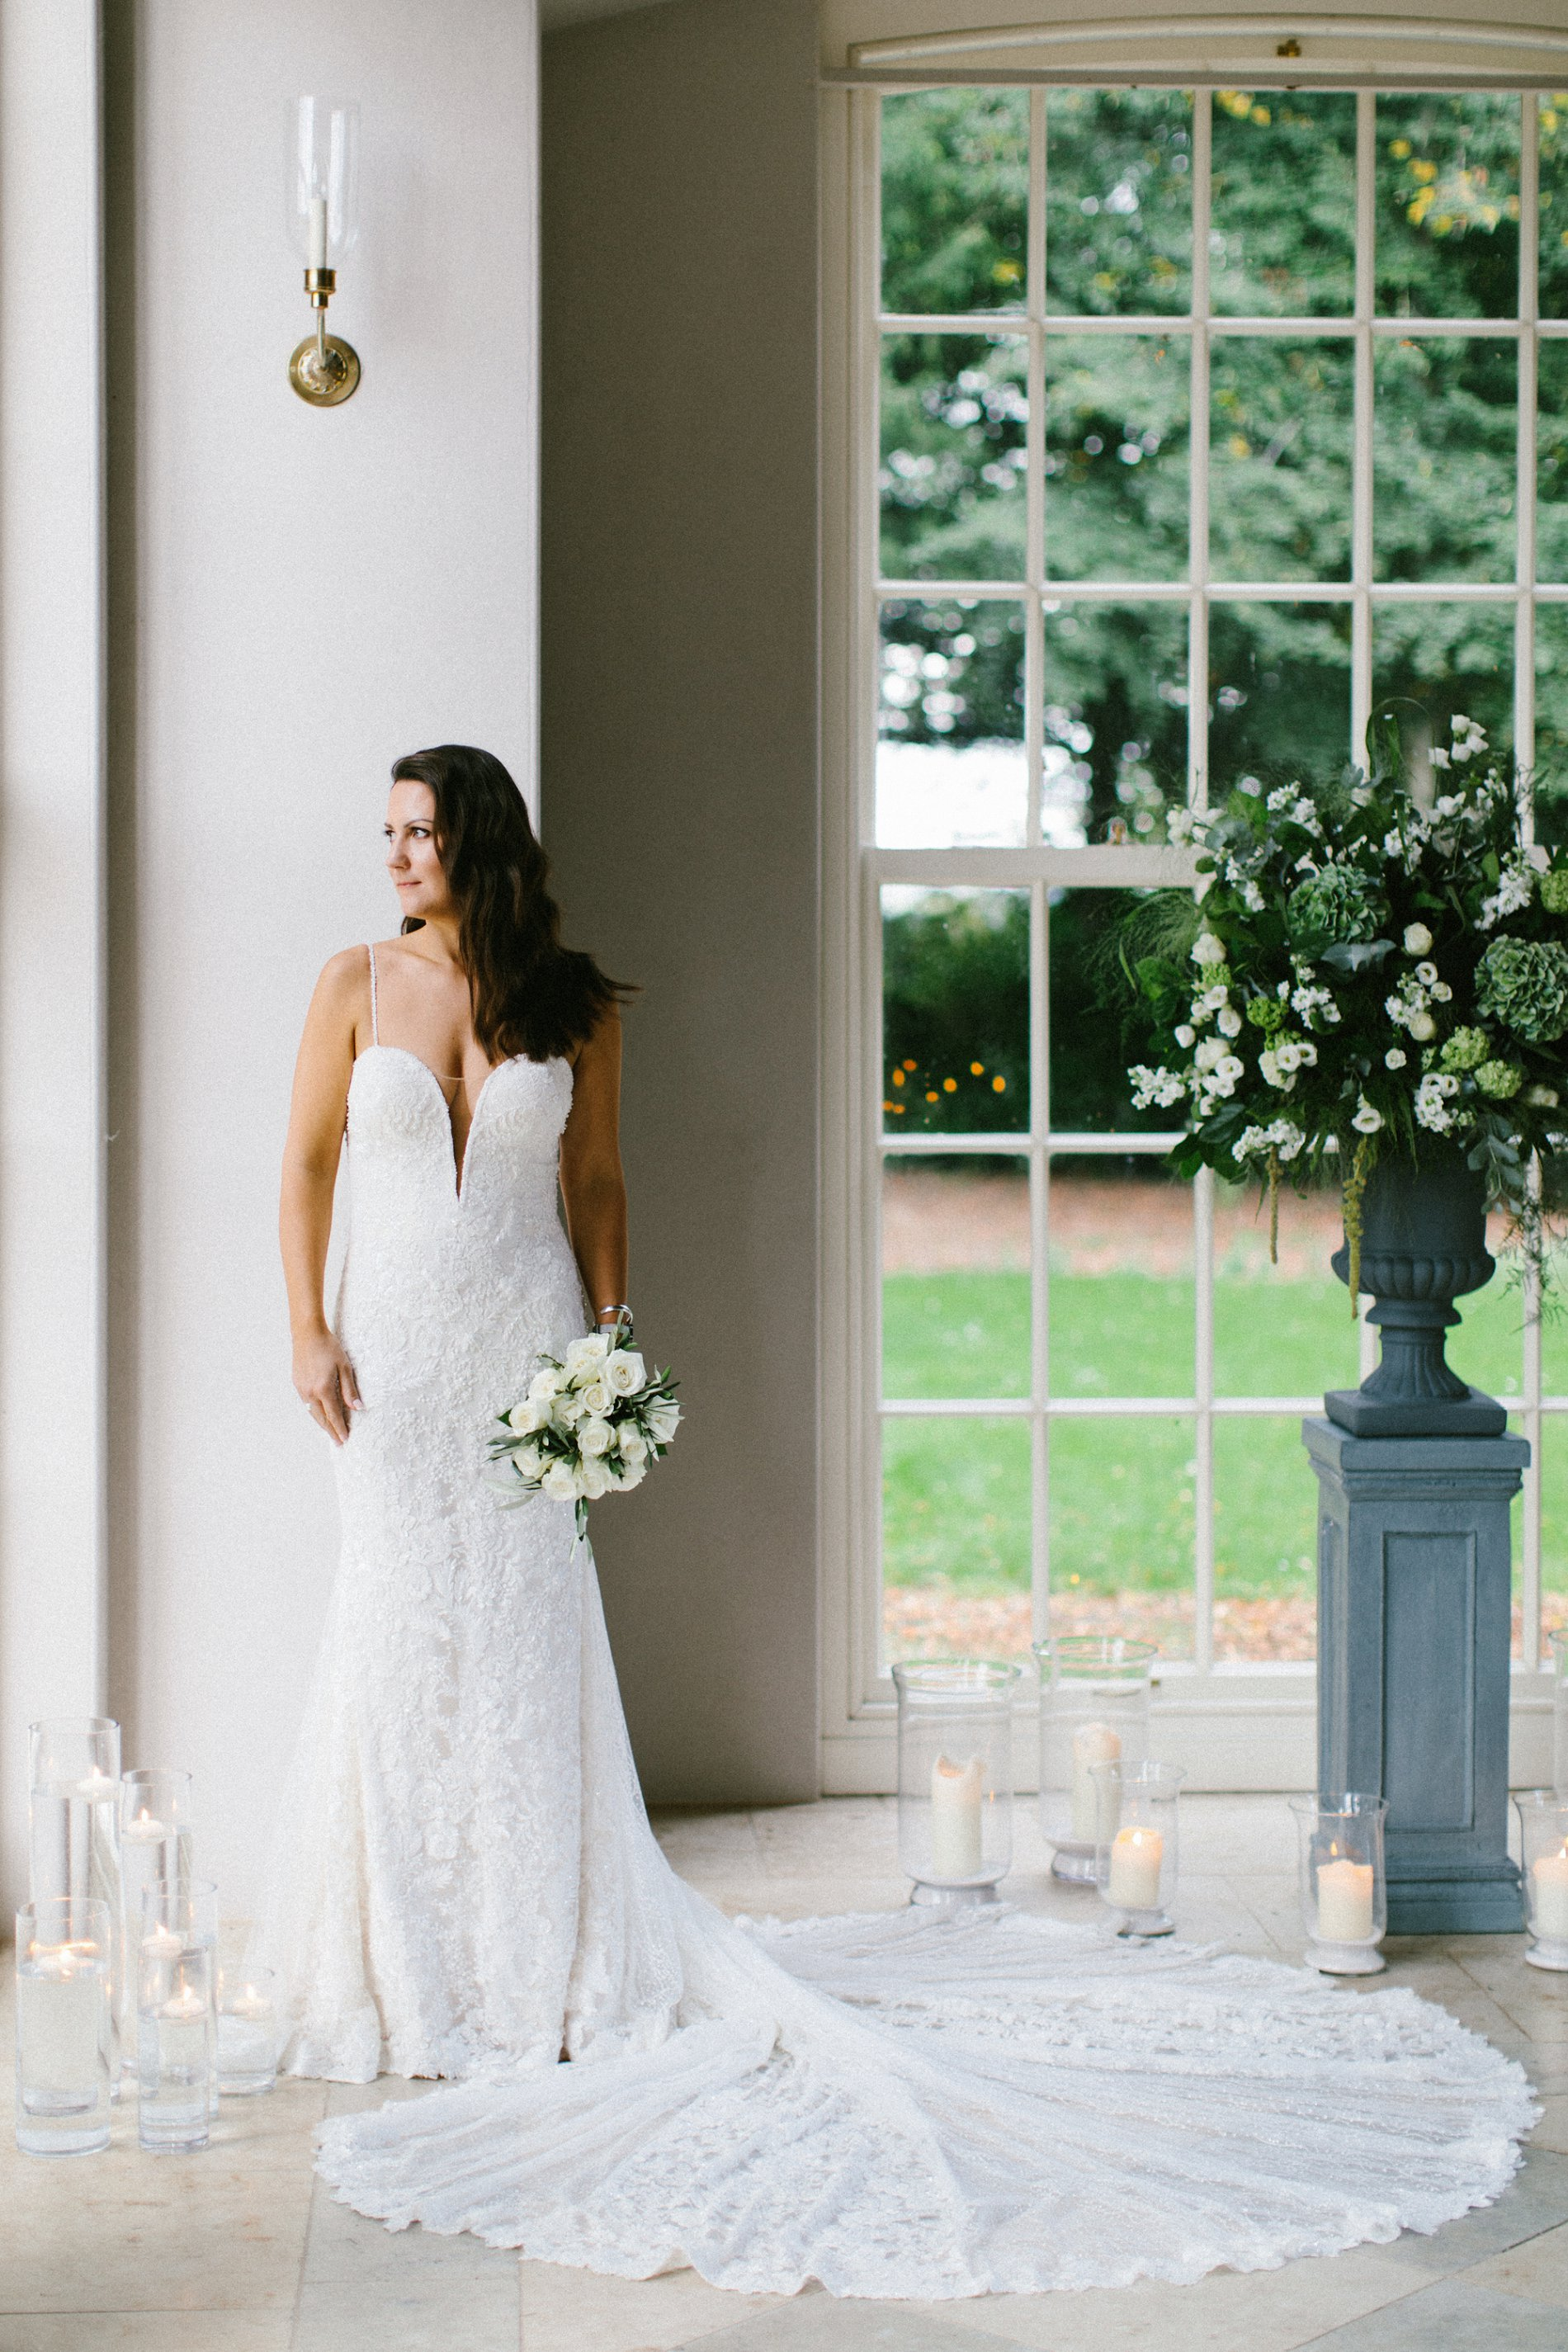 An Intimate Fine Art Wedding Shoot at Newby Hall (c) Melissa Beattie Photography (39)